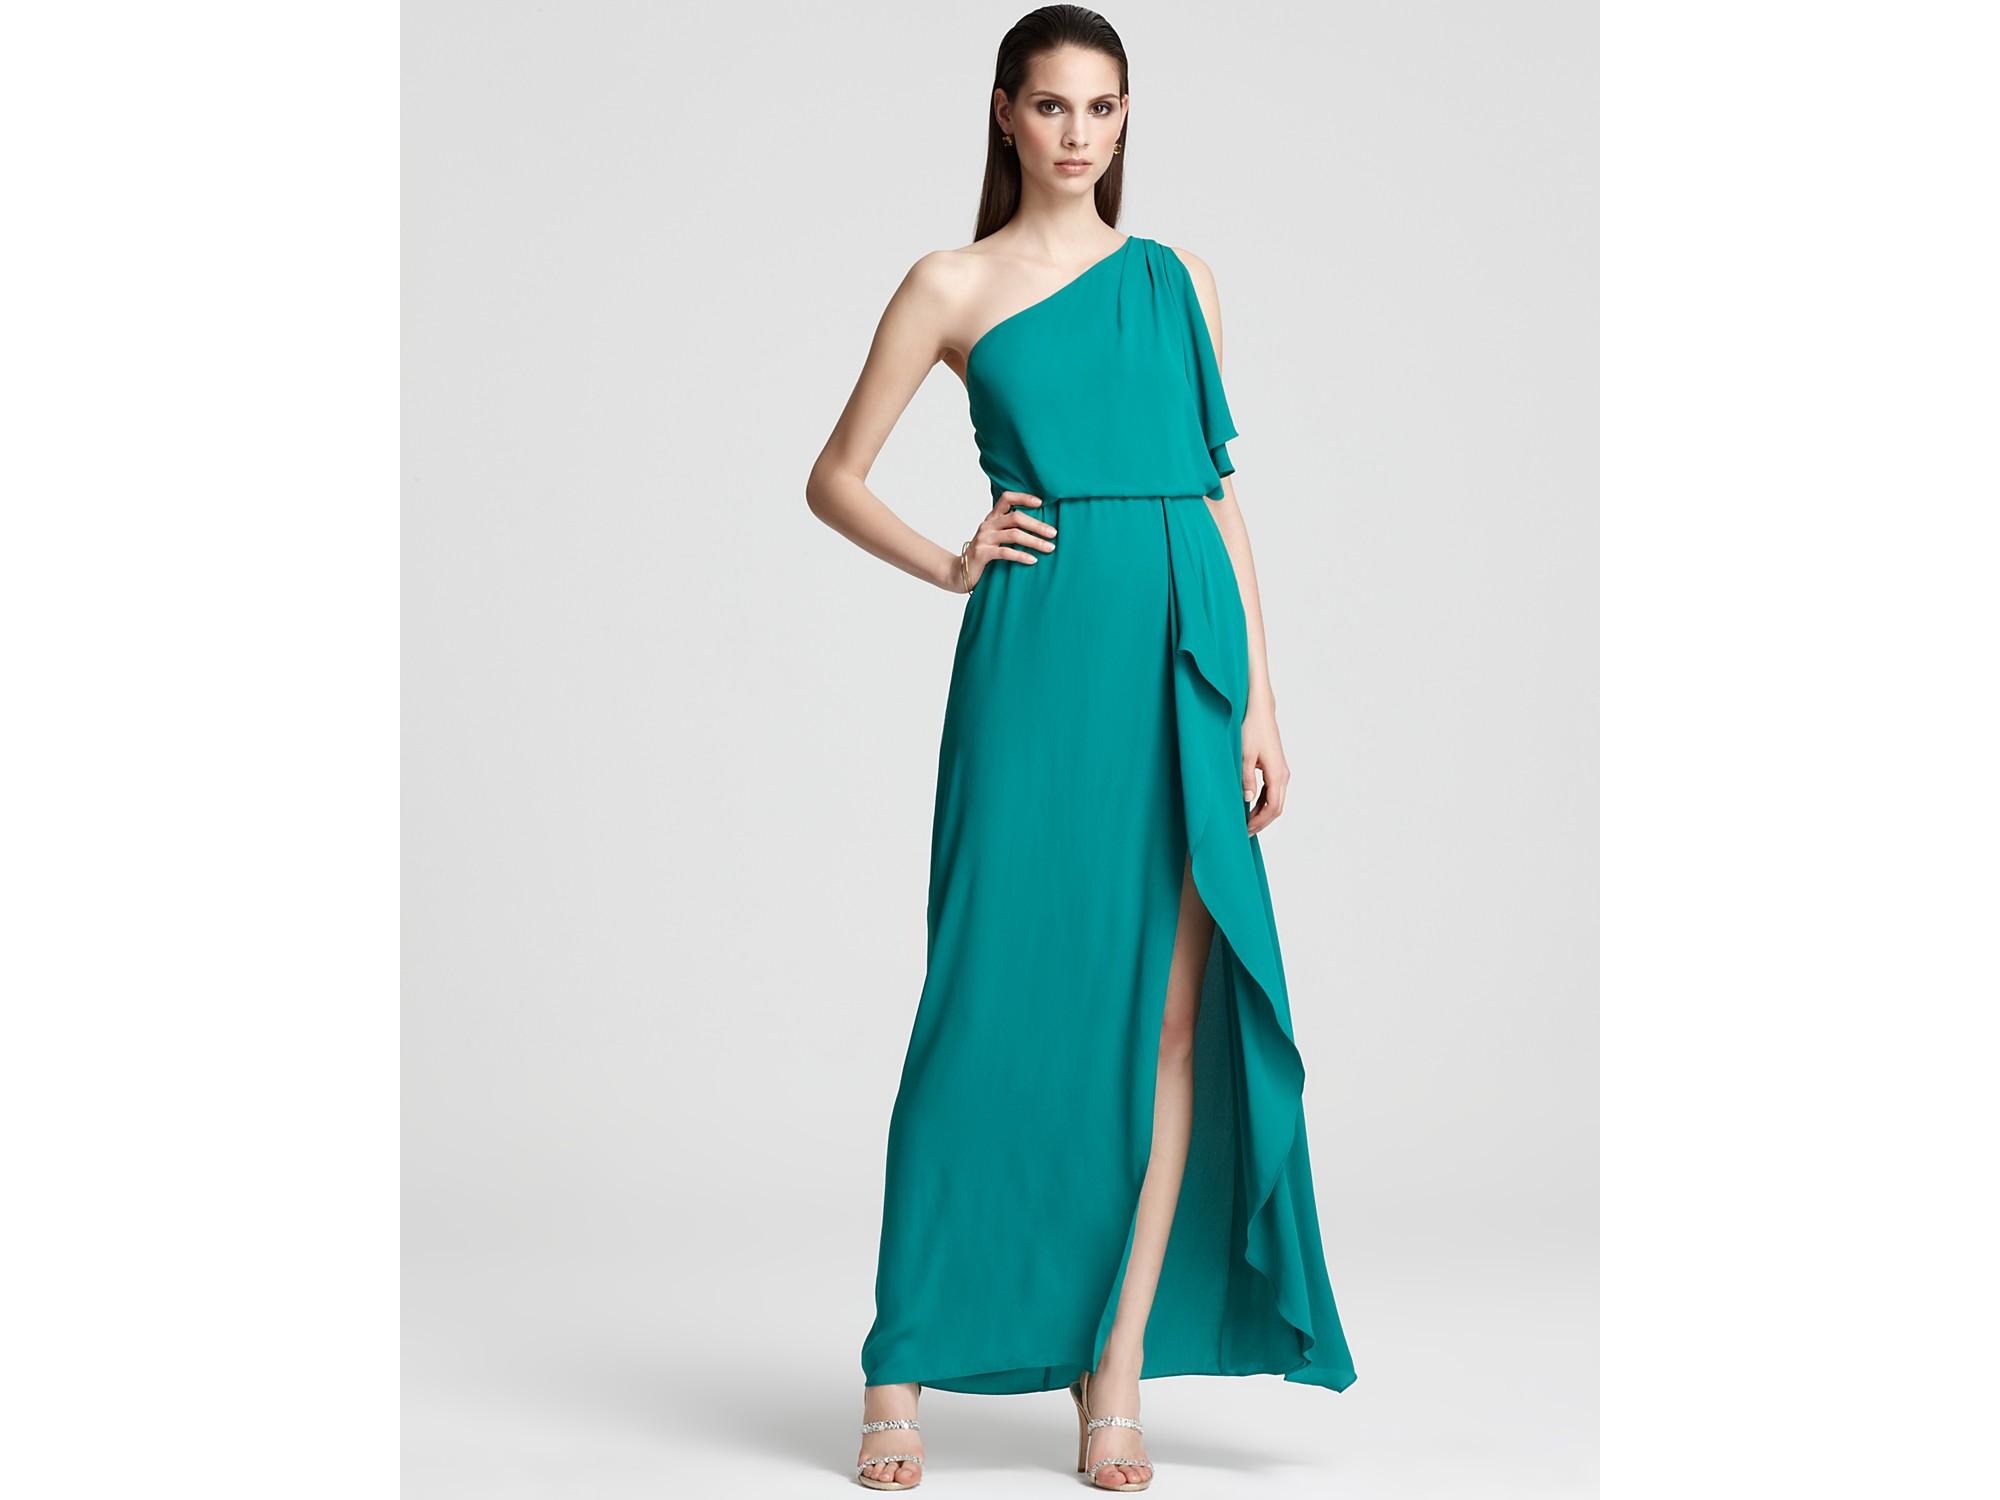 ce6b366d90 BCBGMAXAZRIA One Shoulder Gown Kendal Ruffle in Green - Lyst